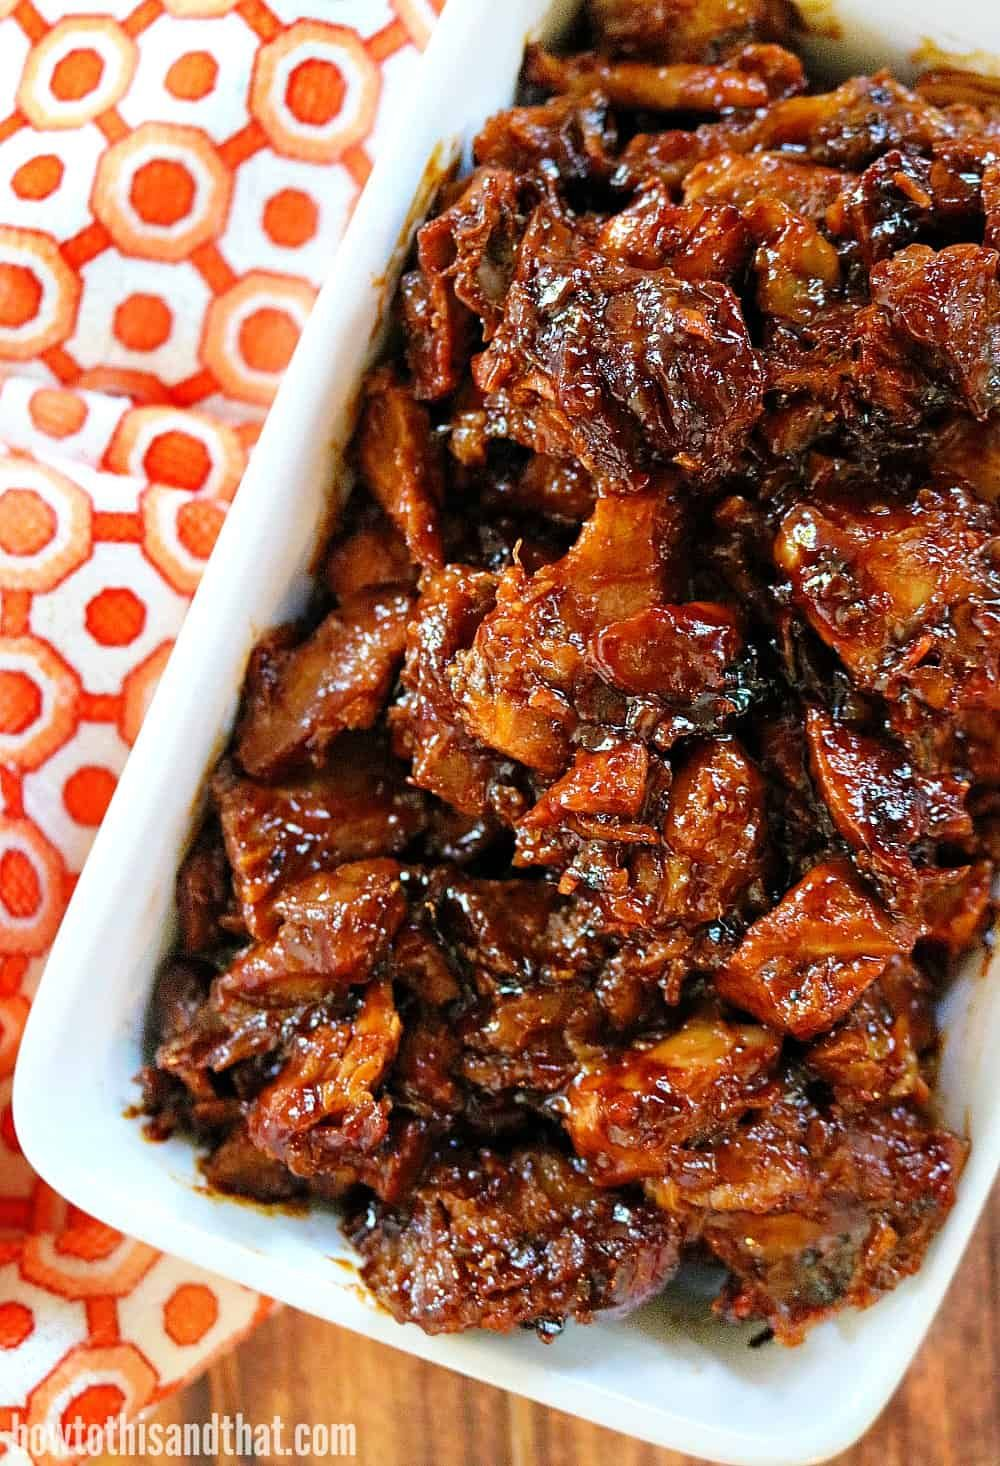 Photo of Slow Cooker Pork- Sweet & Spicy Brown Sugar